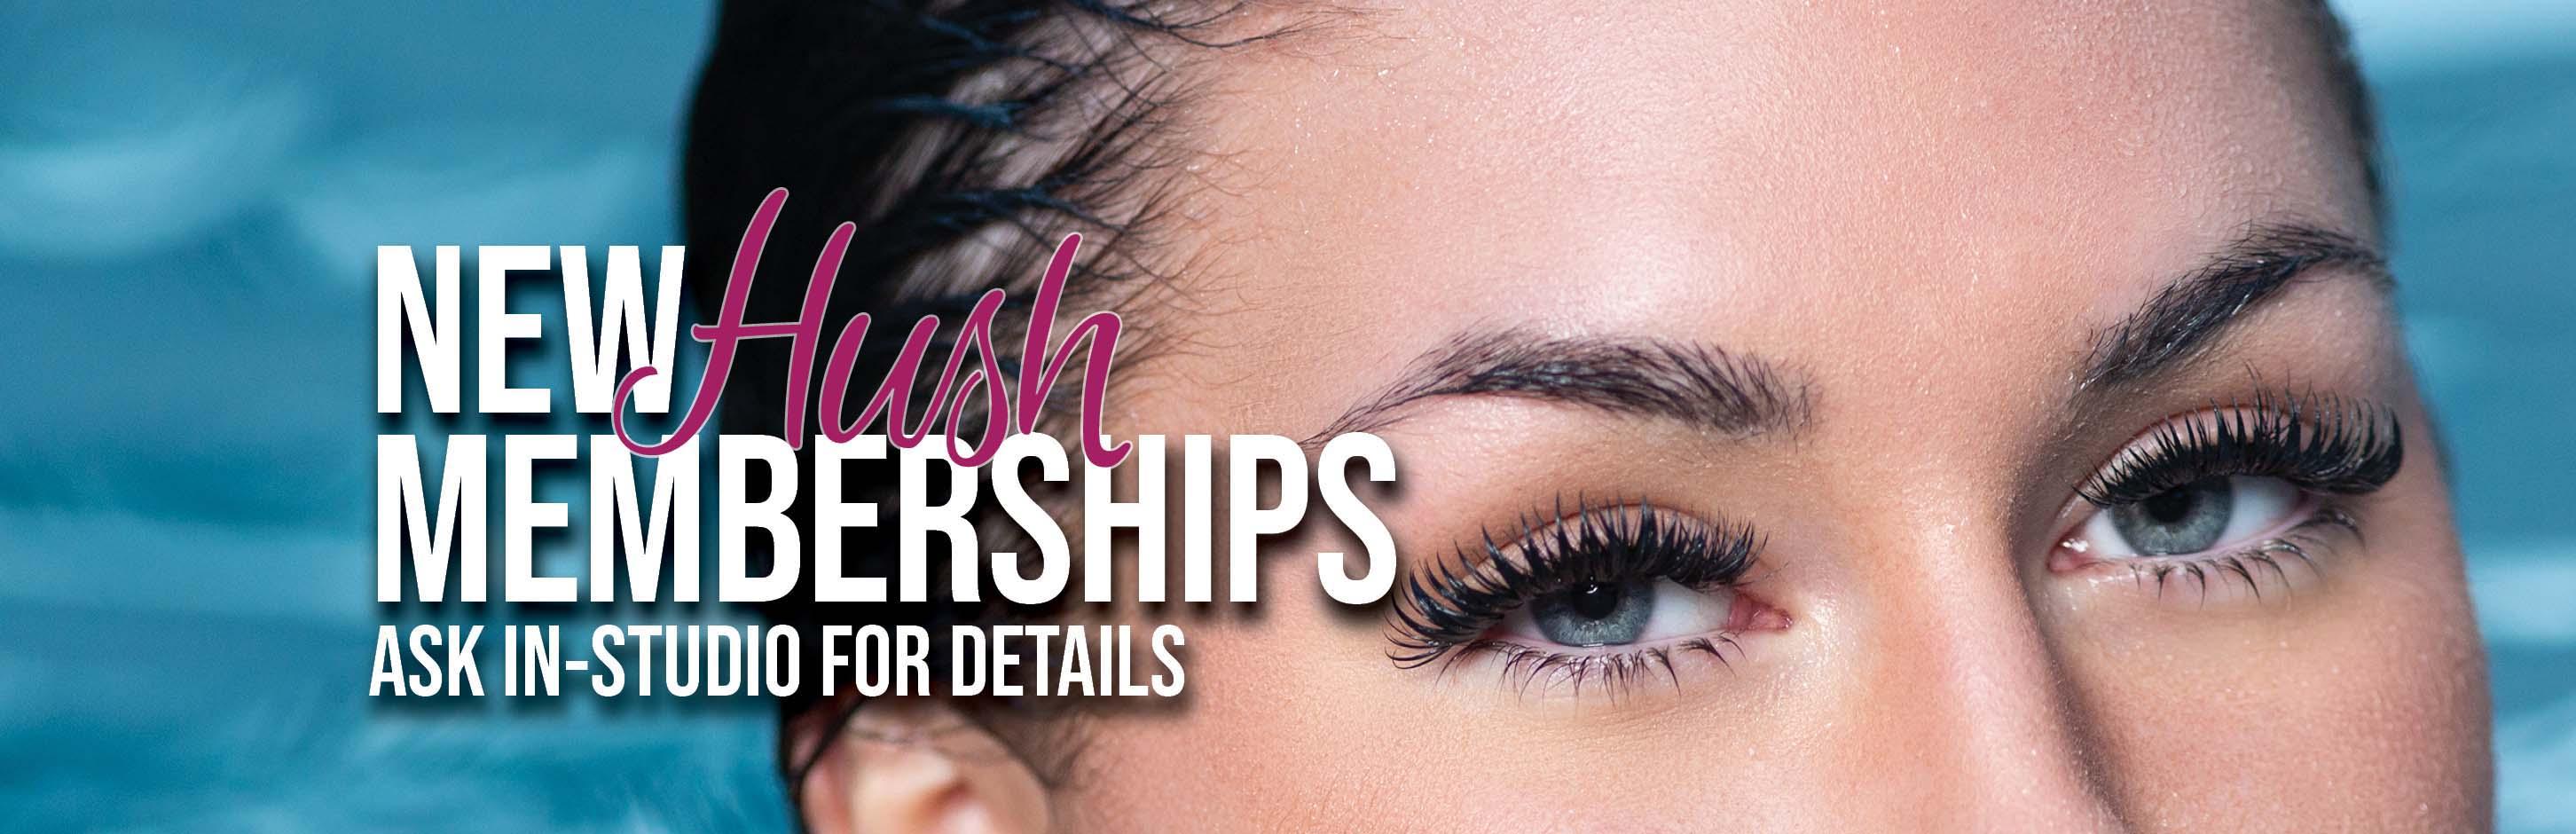 025857c7a54 Eyelash Extensions | Hush Lash Studio